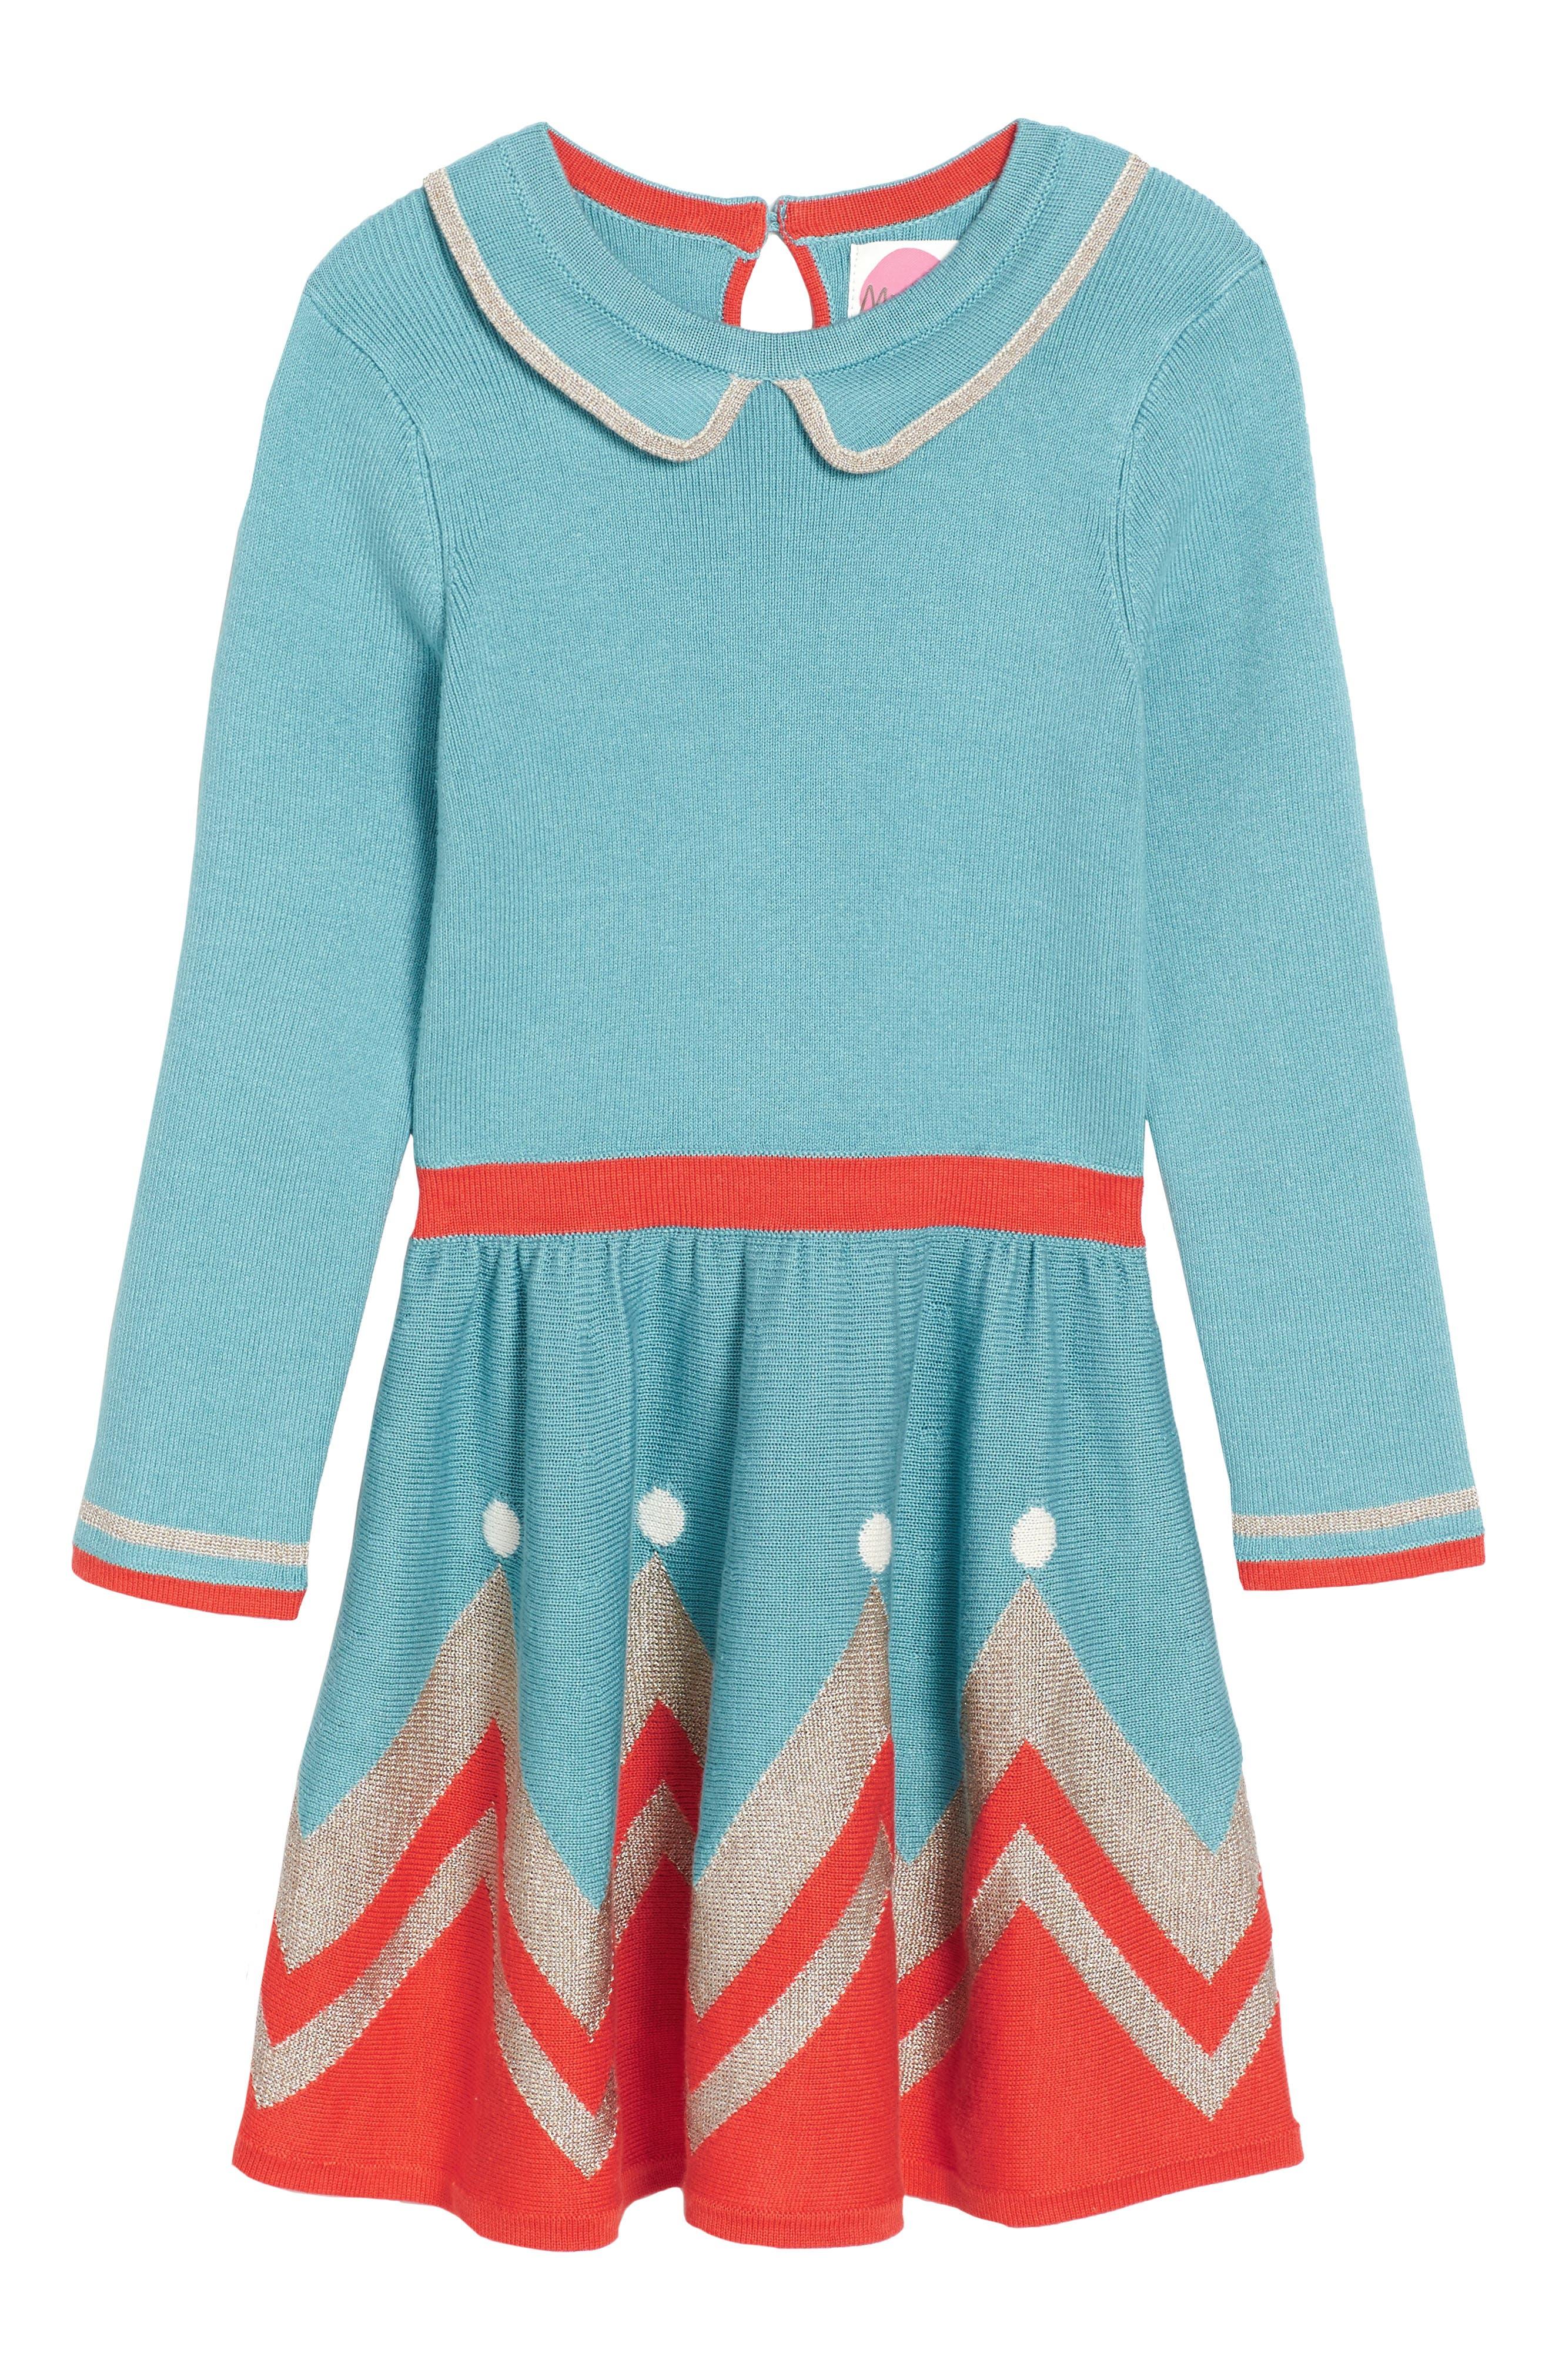 Mini Boden Sparkly Intarsia Knit Dress (Toddler Girls, Little Girls & Big Girls)